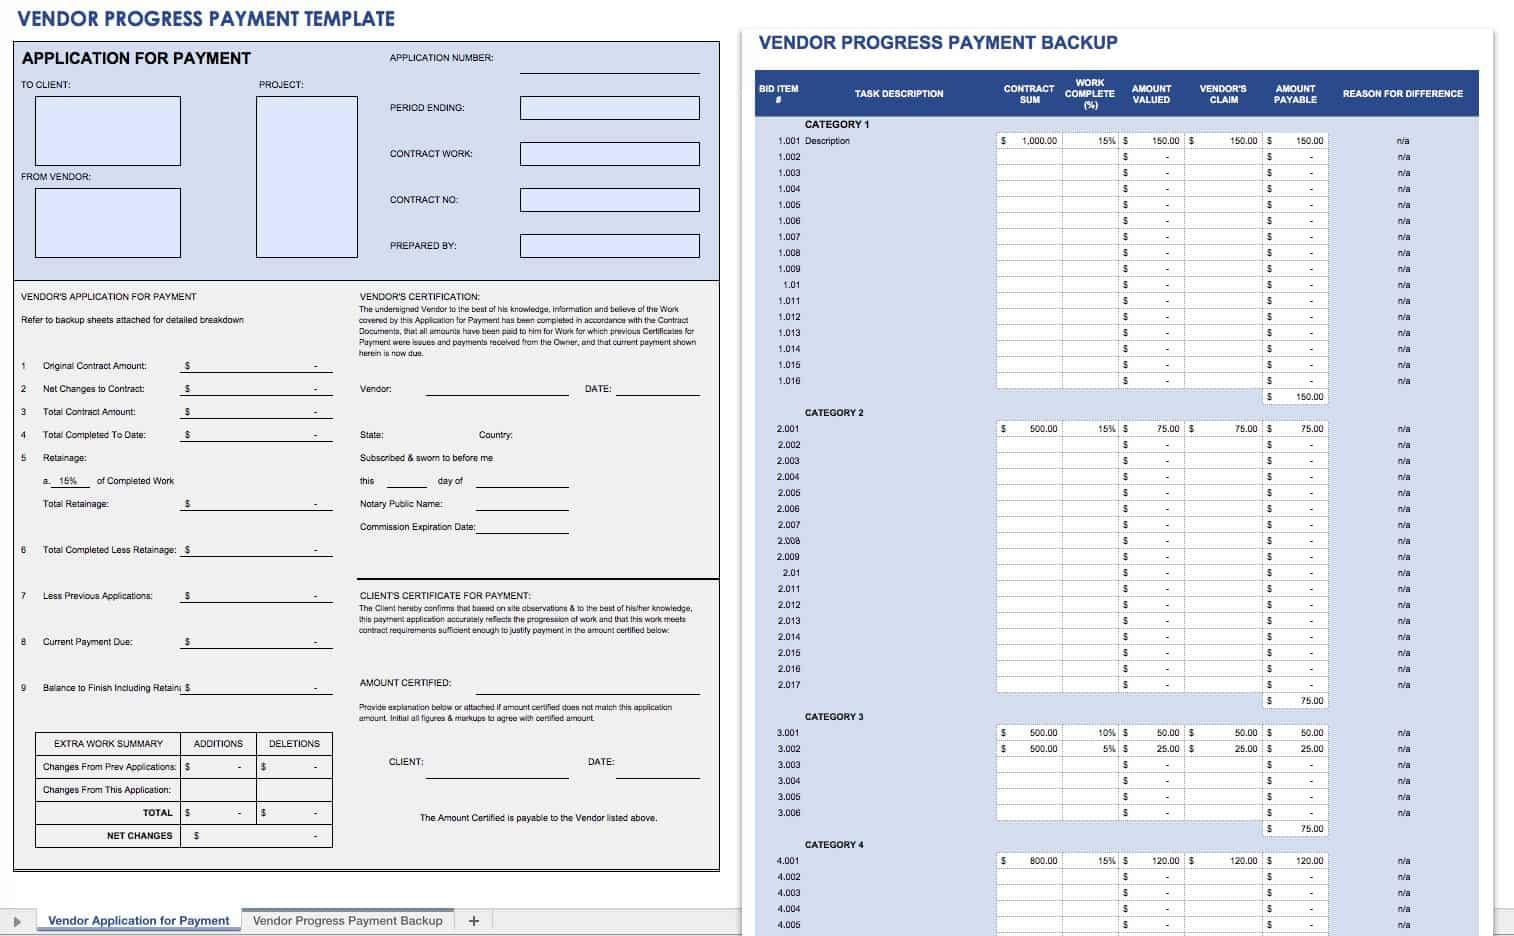 Vendor Progress Payment Template